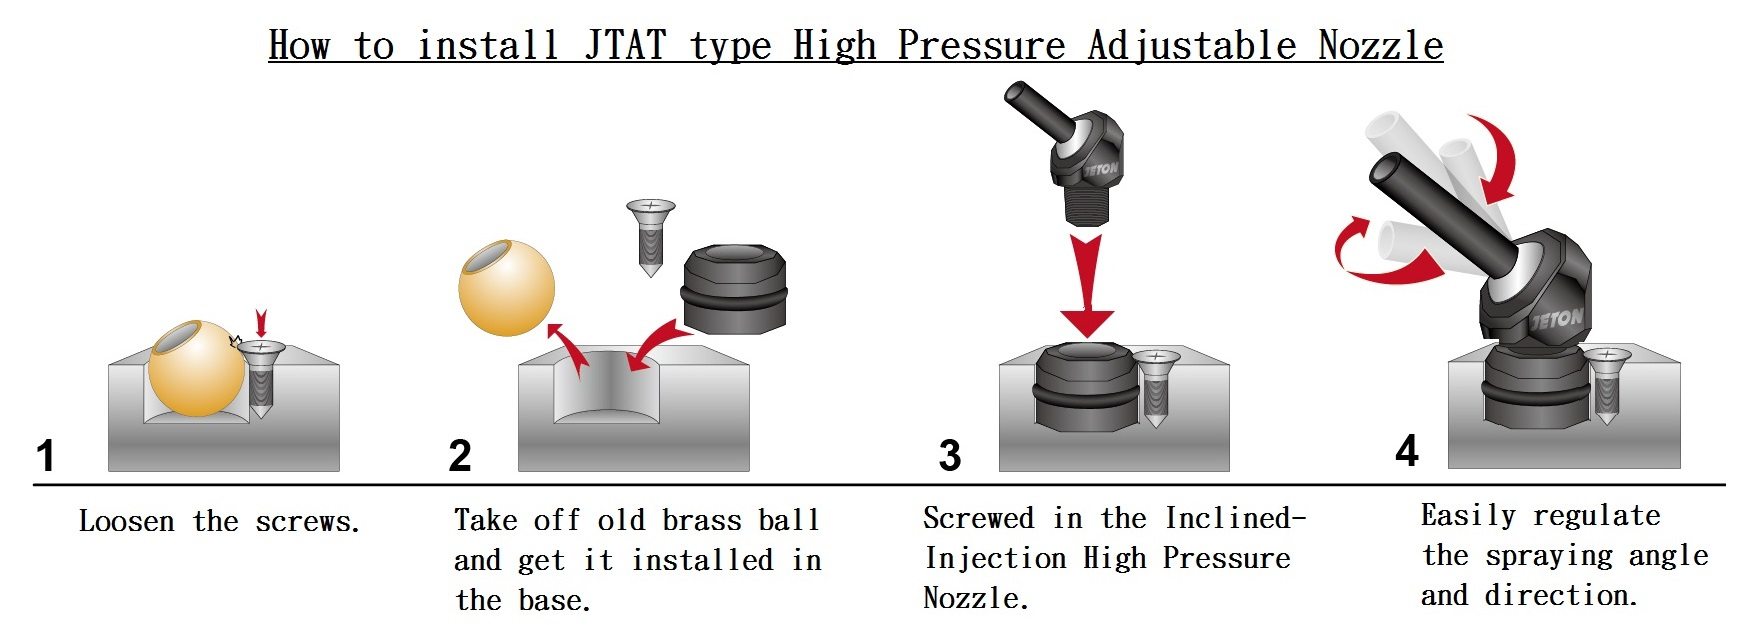 JETON Easy Jet-On High Pressure Adjustable Nozzle JTAT-12-M6-20